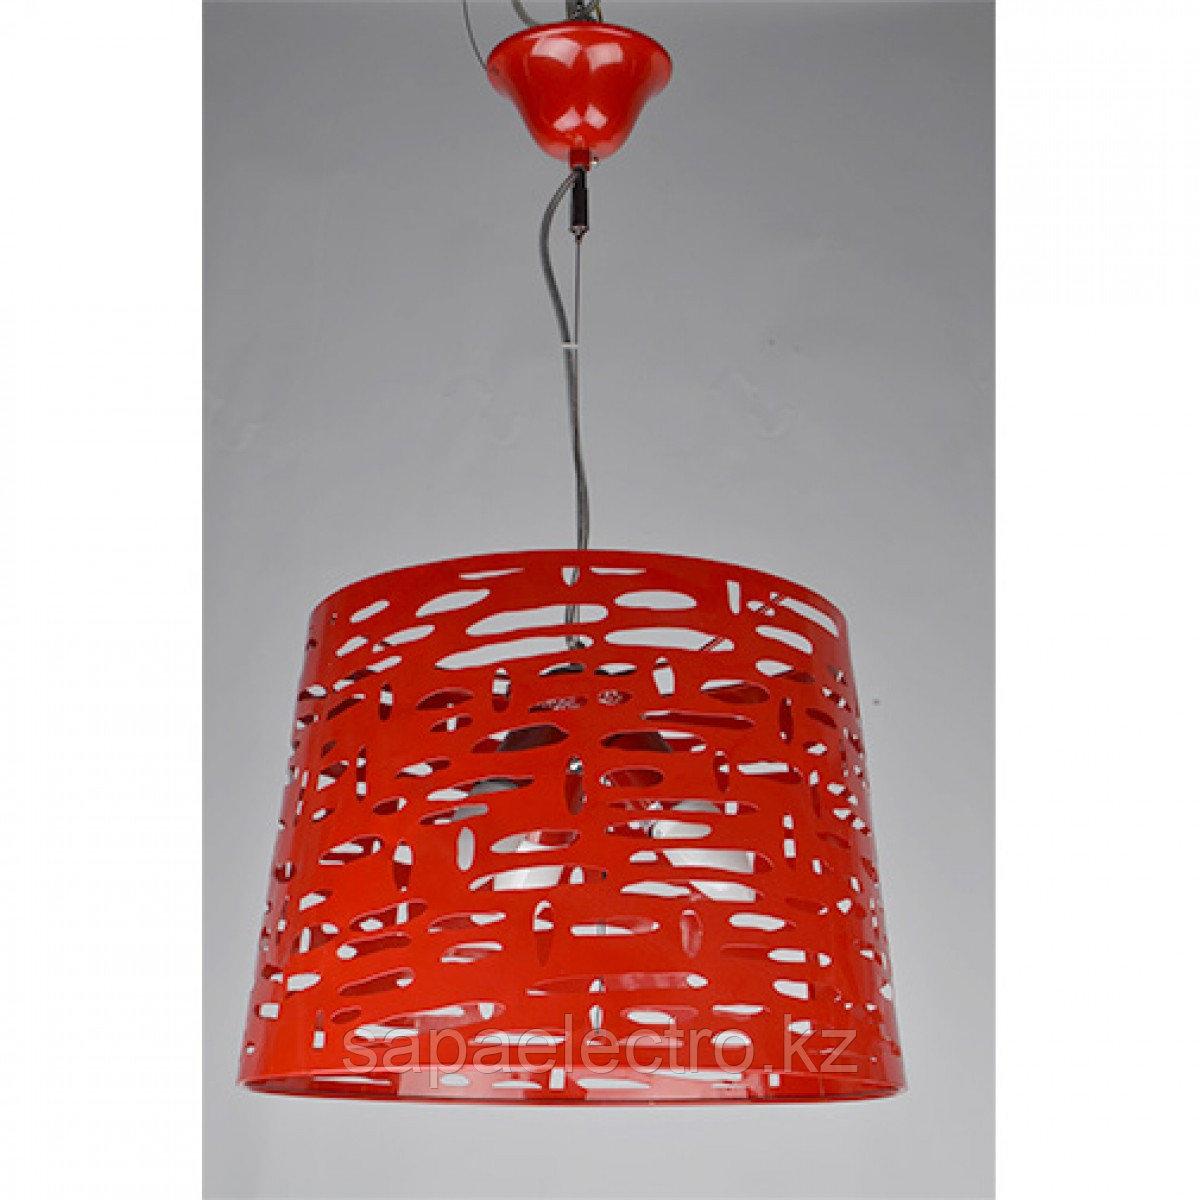 Свет-к T259/3L 3XE27 60W RED (ASYA AVIZE) 1шт